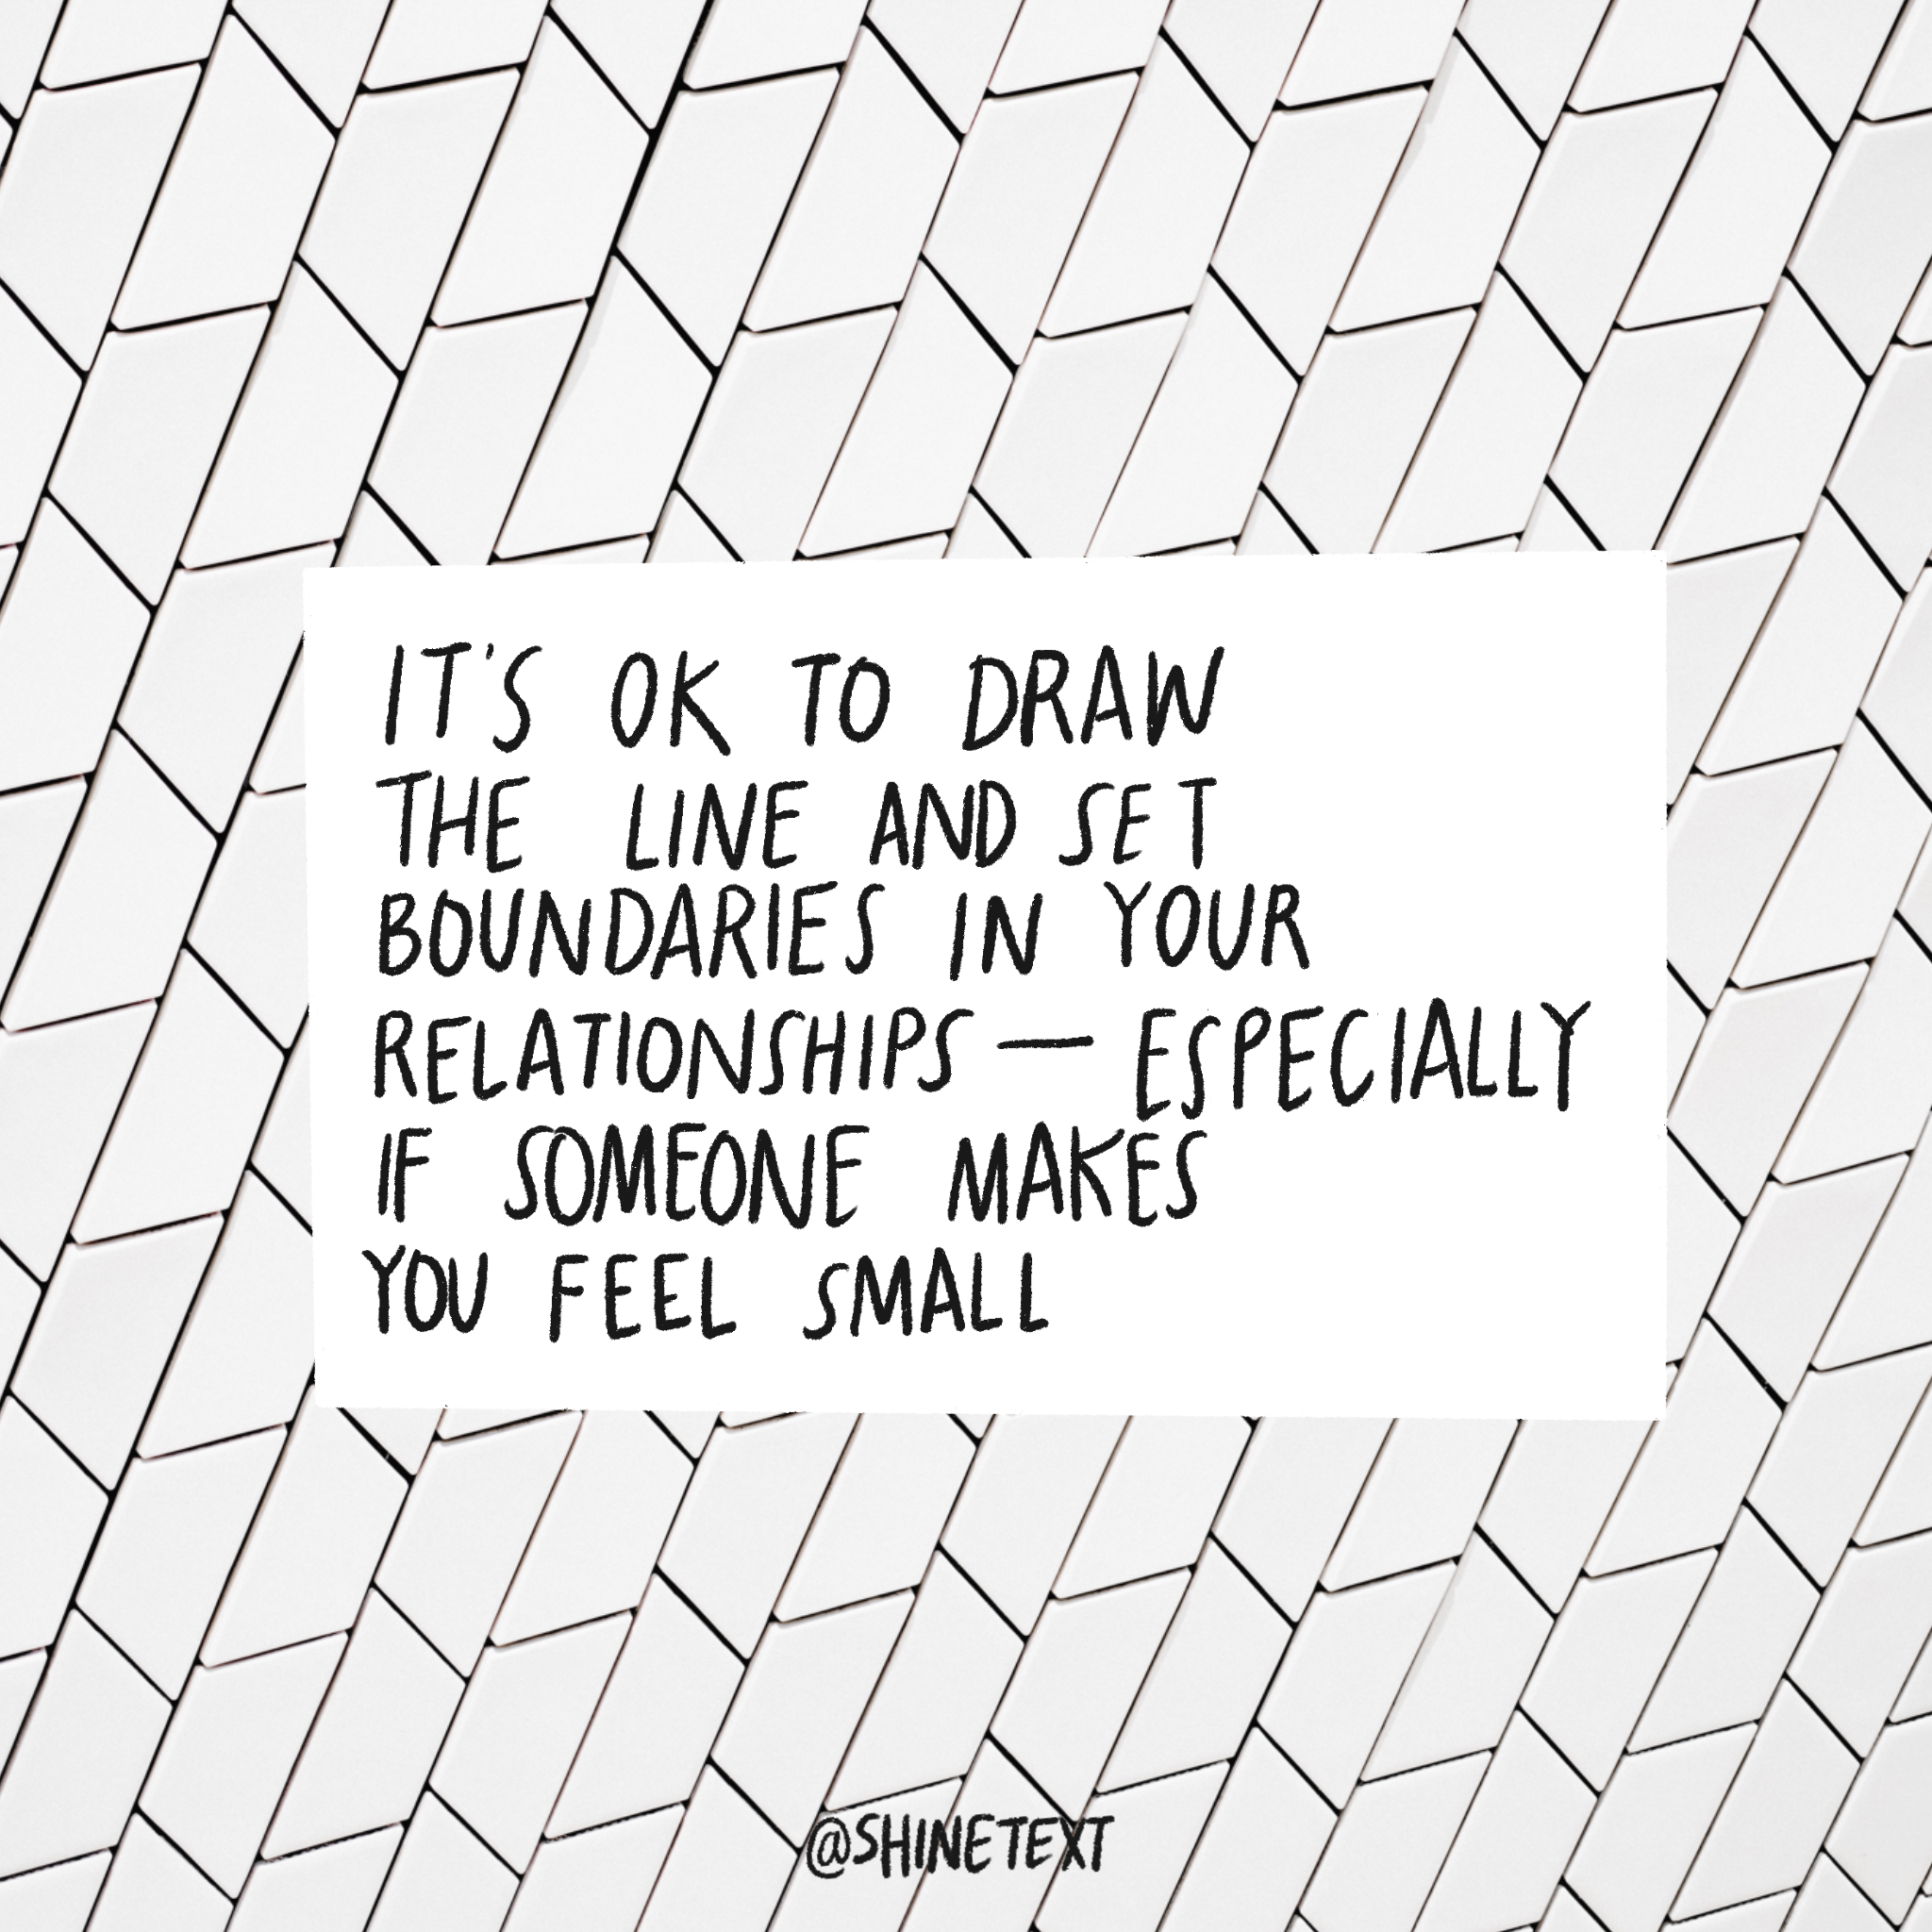 Learn to create Boundaries